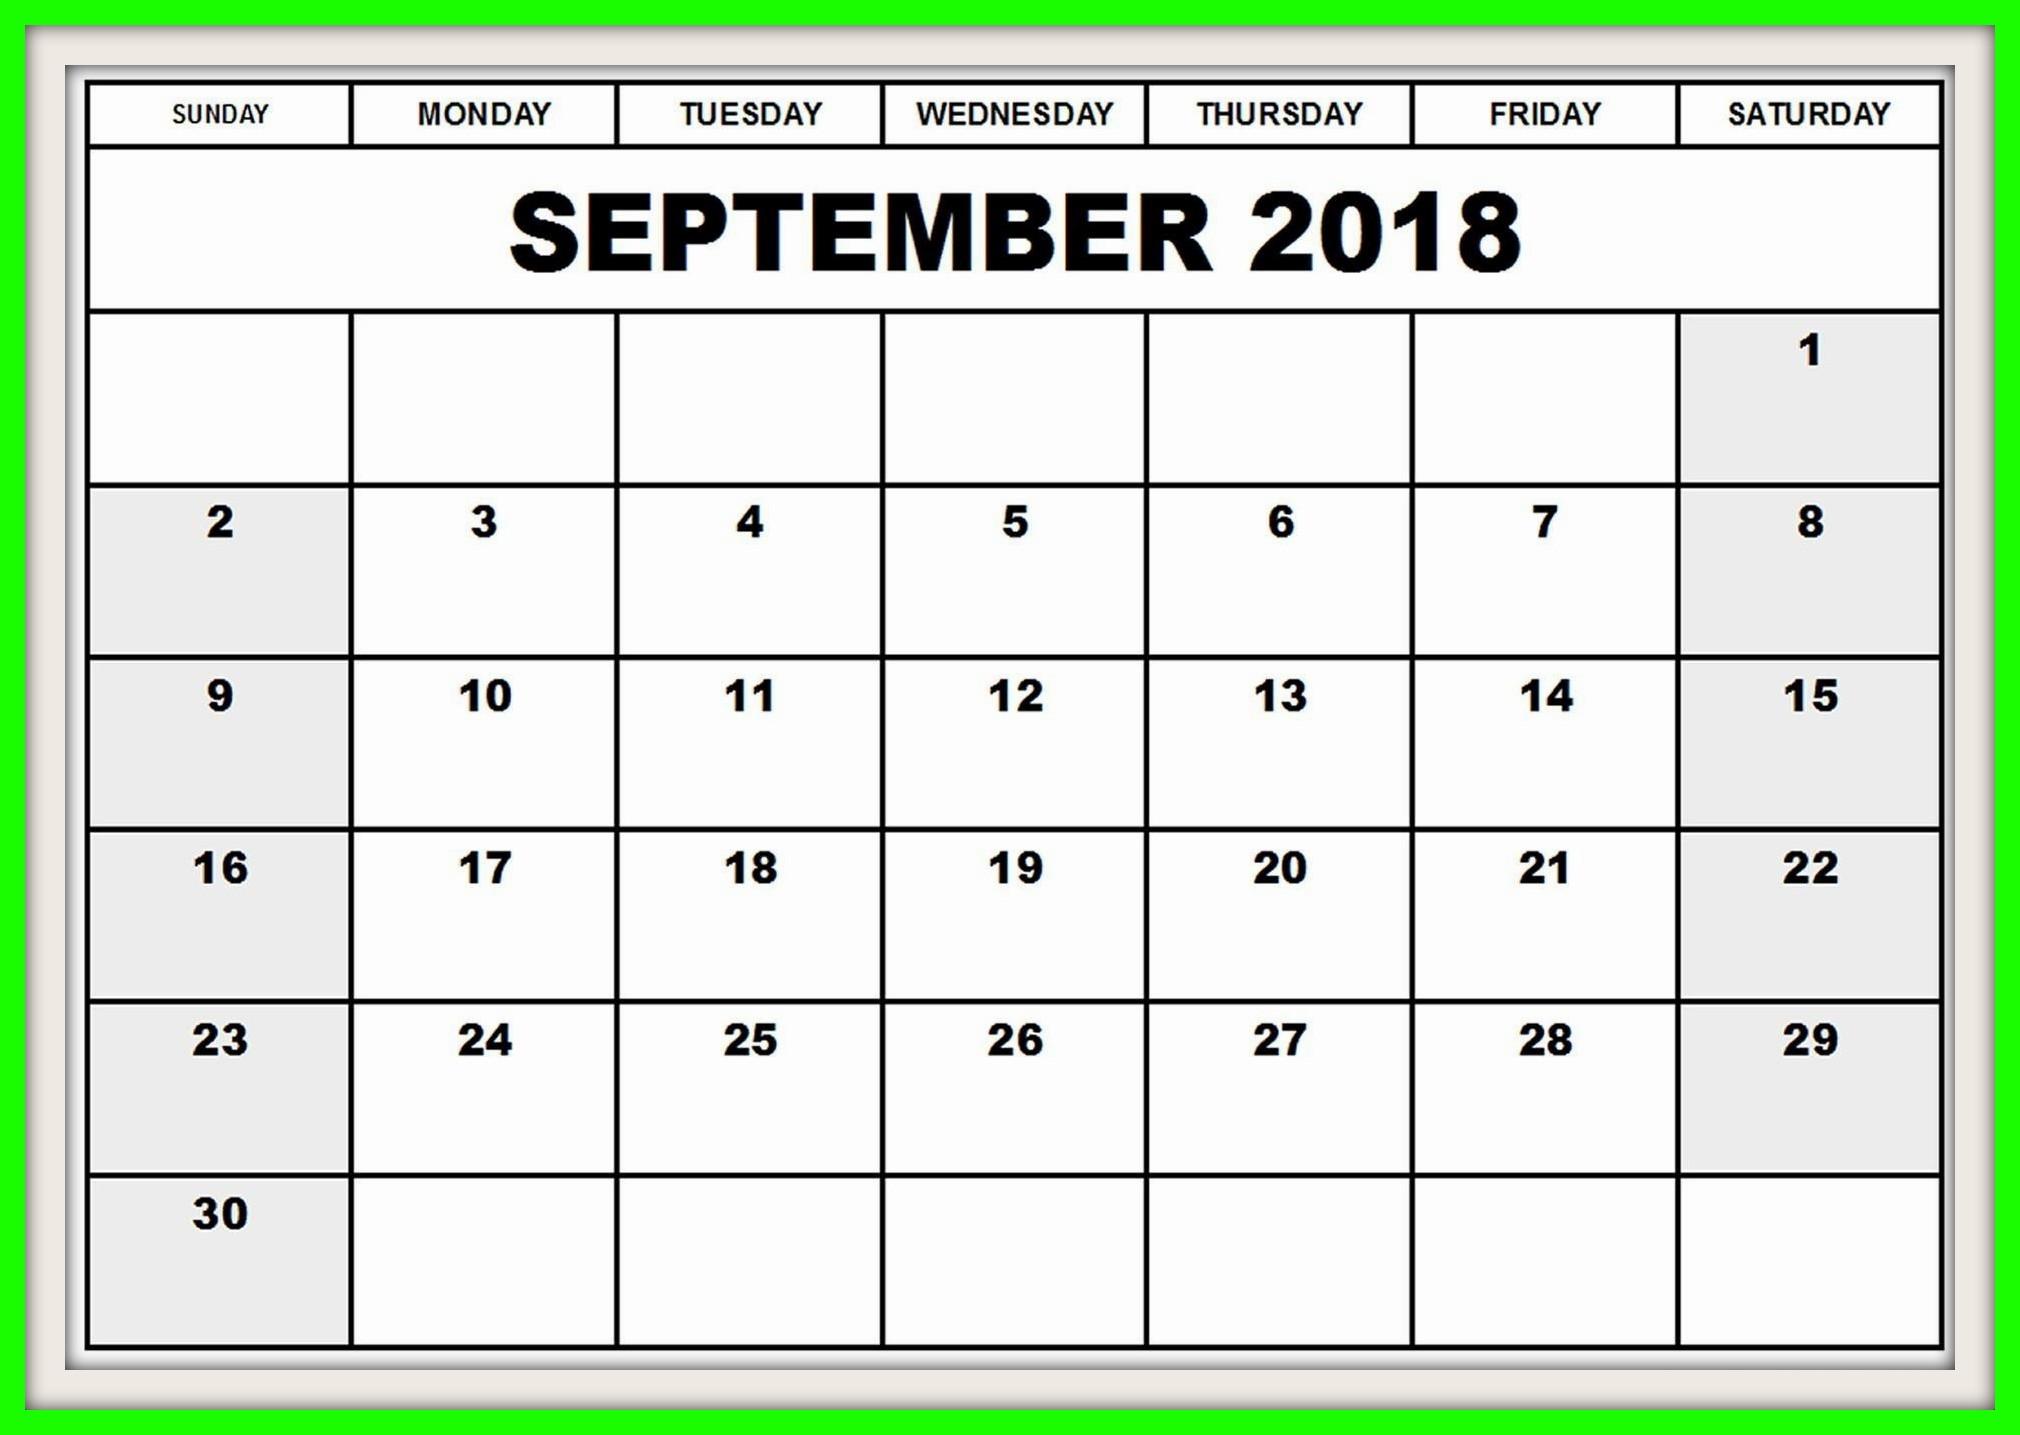 September 2018 Calendar with Holidays Printable